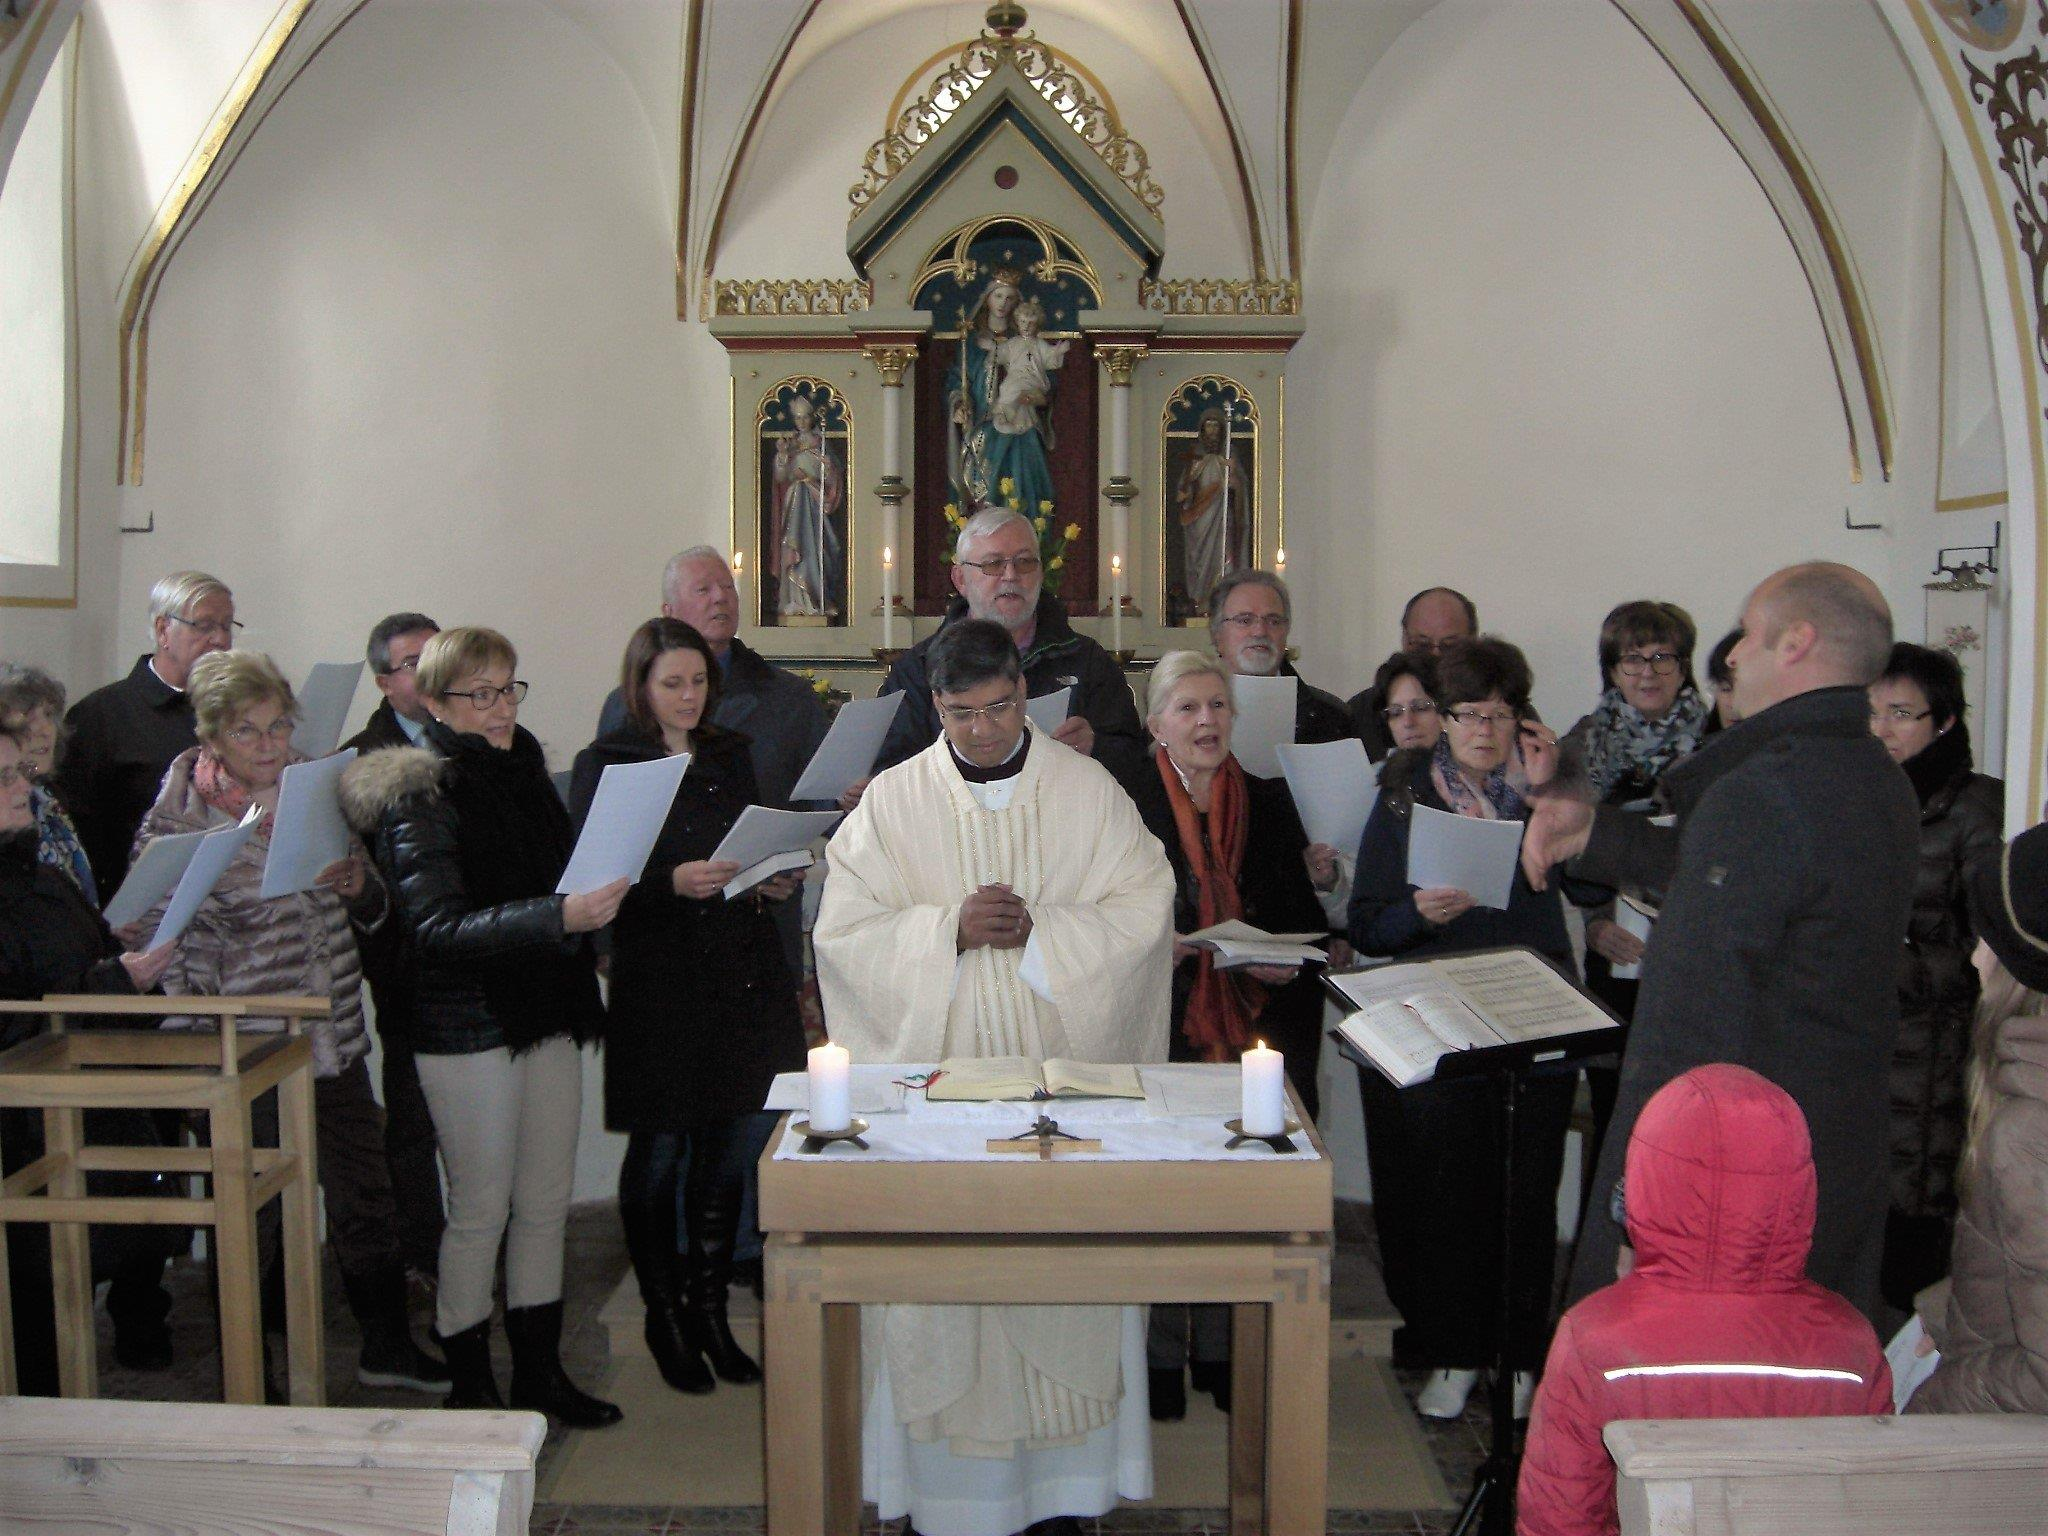 Patroziniumsgottesdienst in Latz